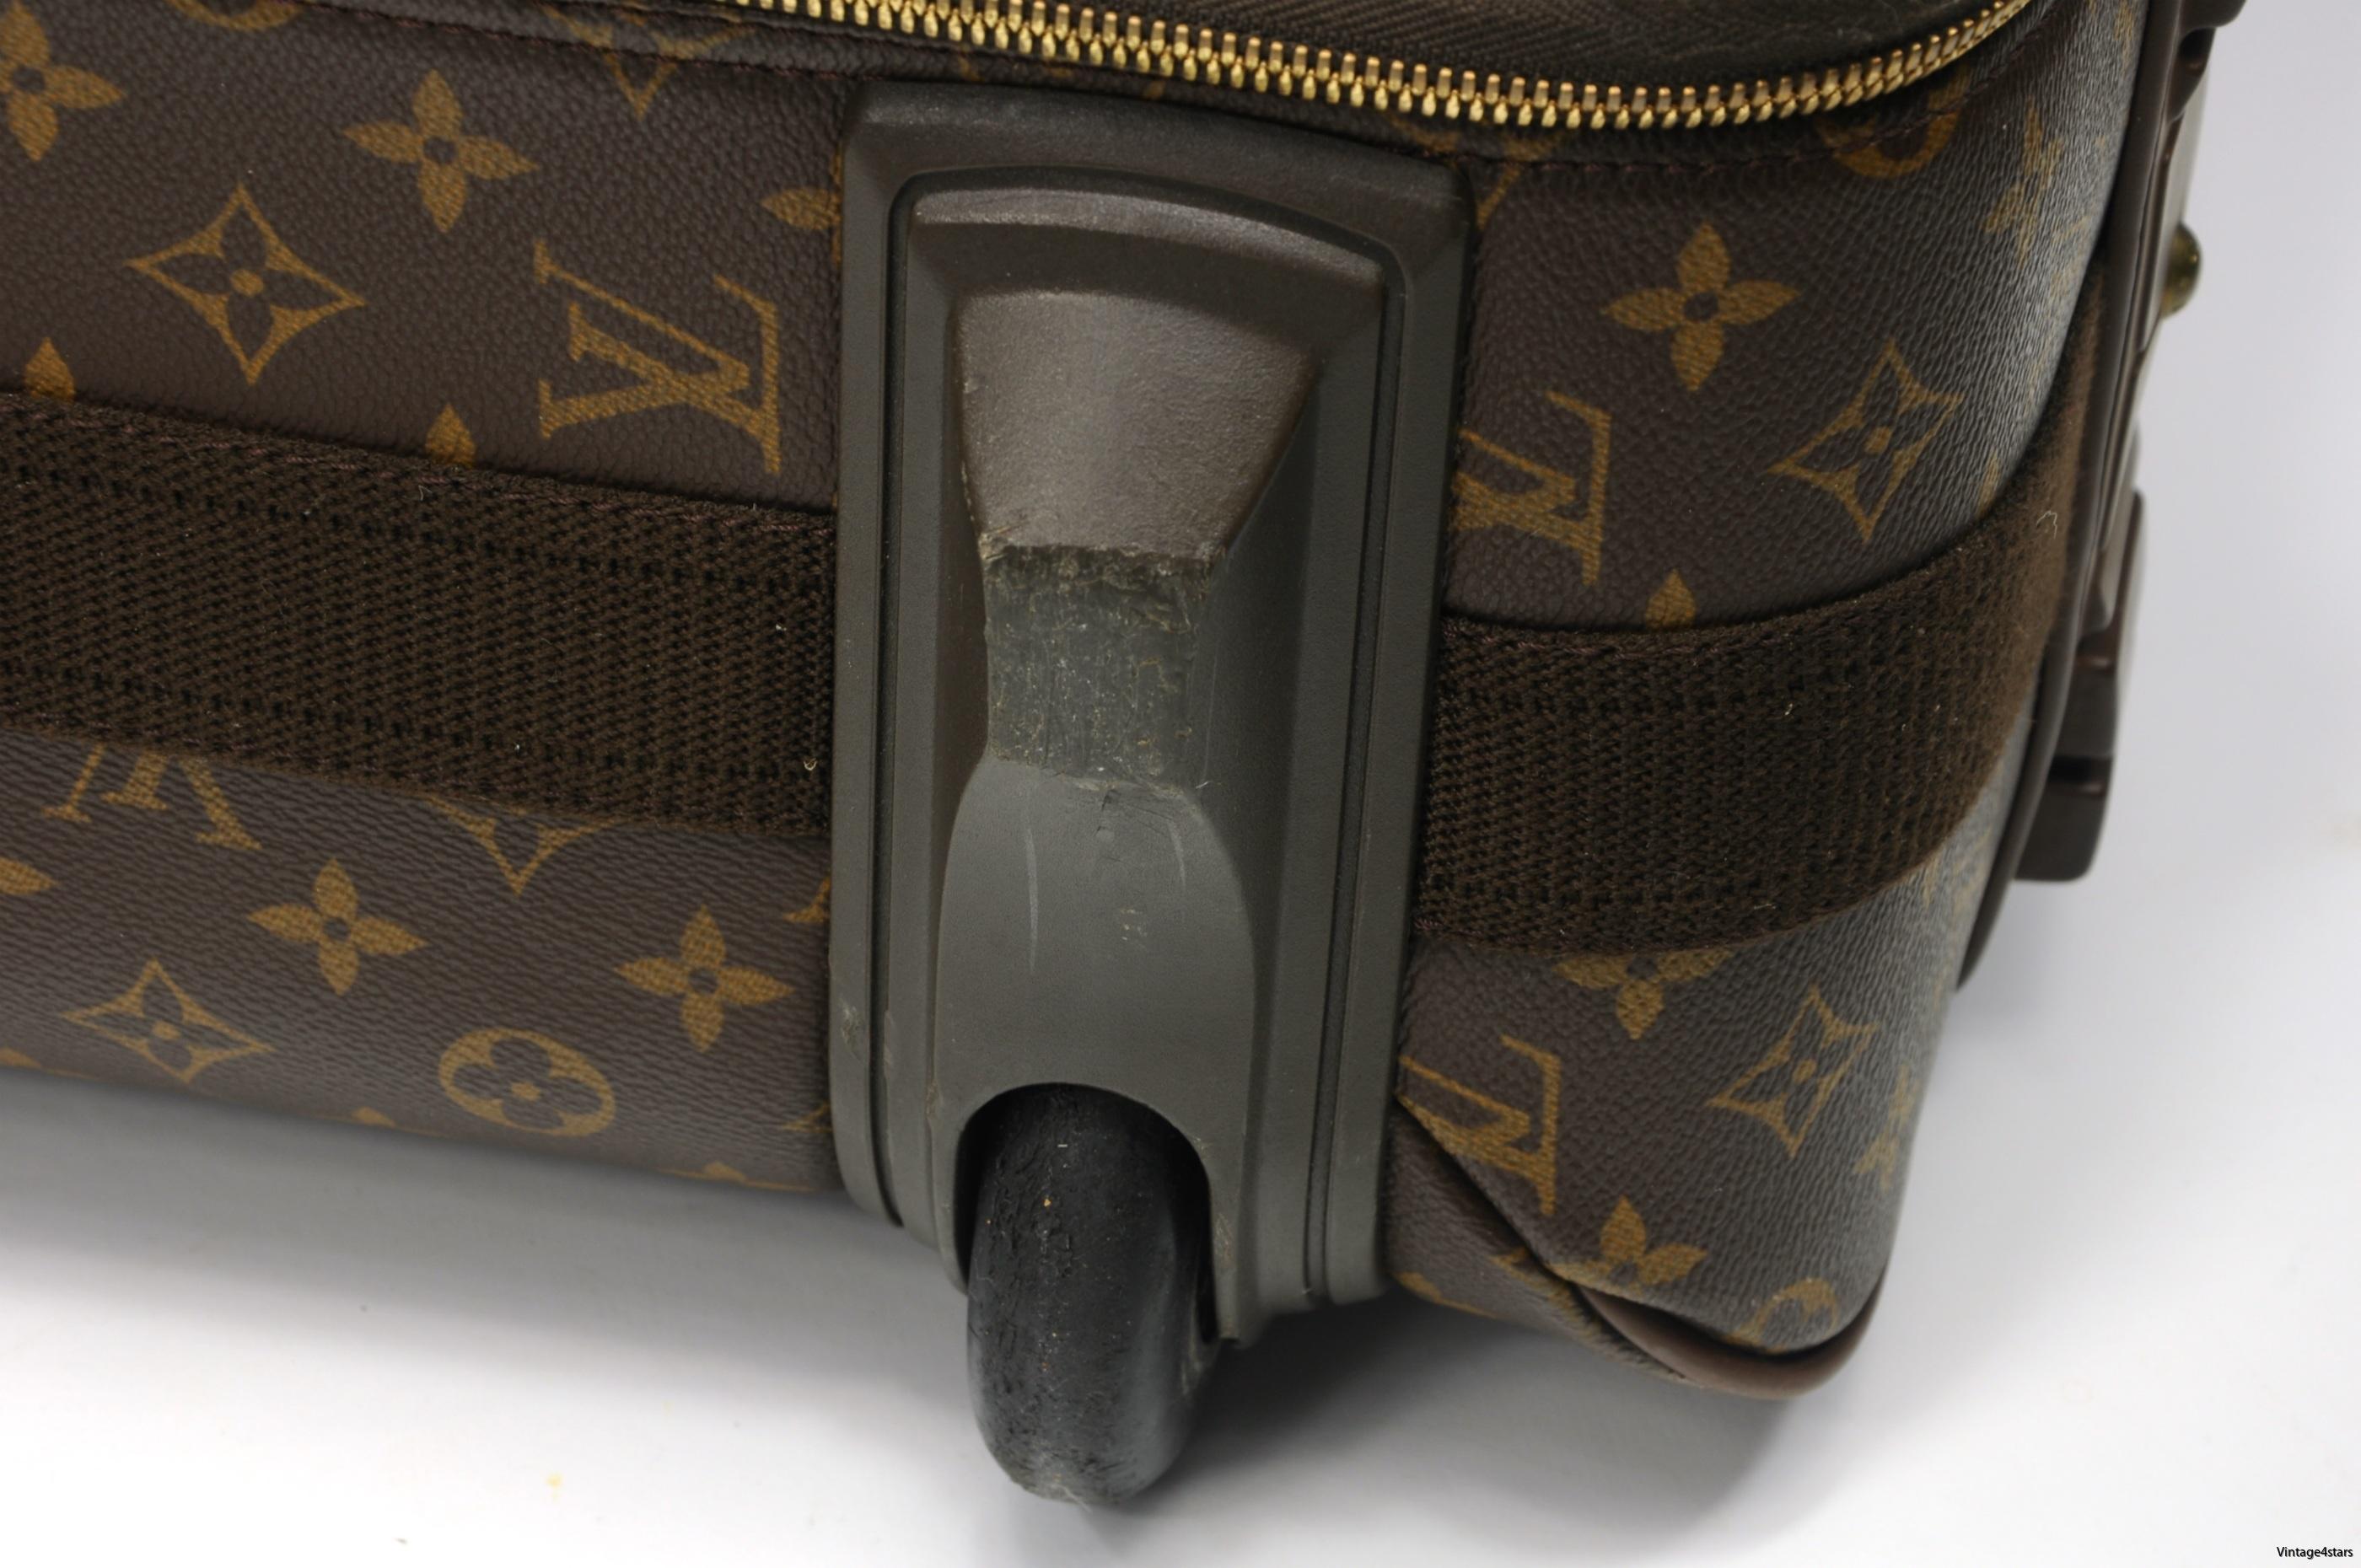 Louis Vuitton Pegase 55 Monogram 8